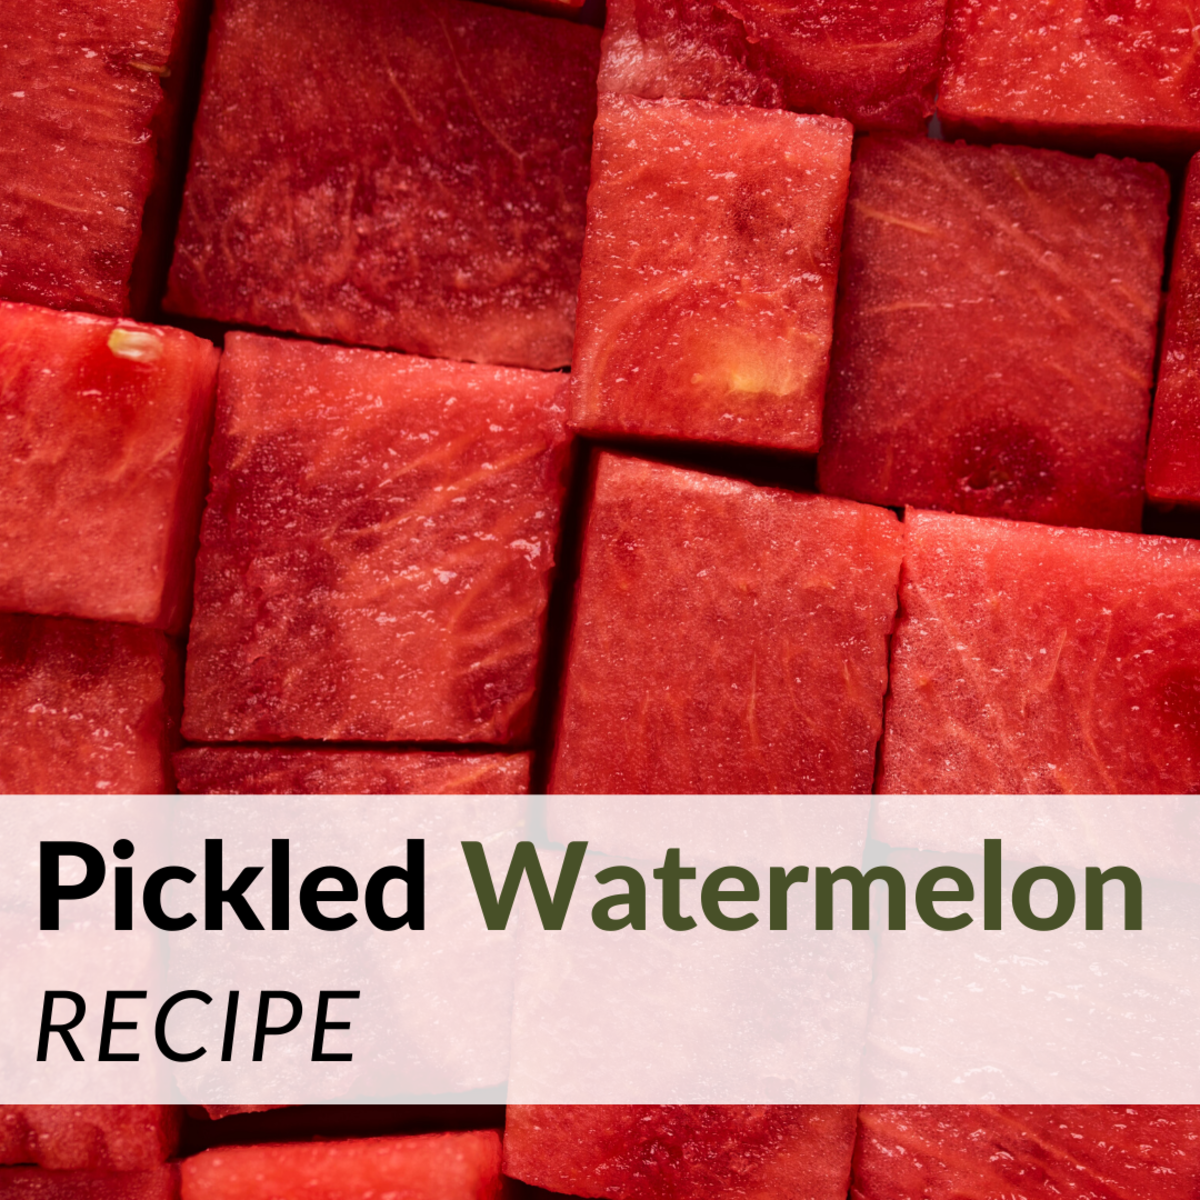 Pickled Watermelon Recipe: Summertime in a Jar